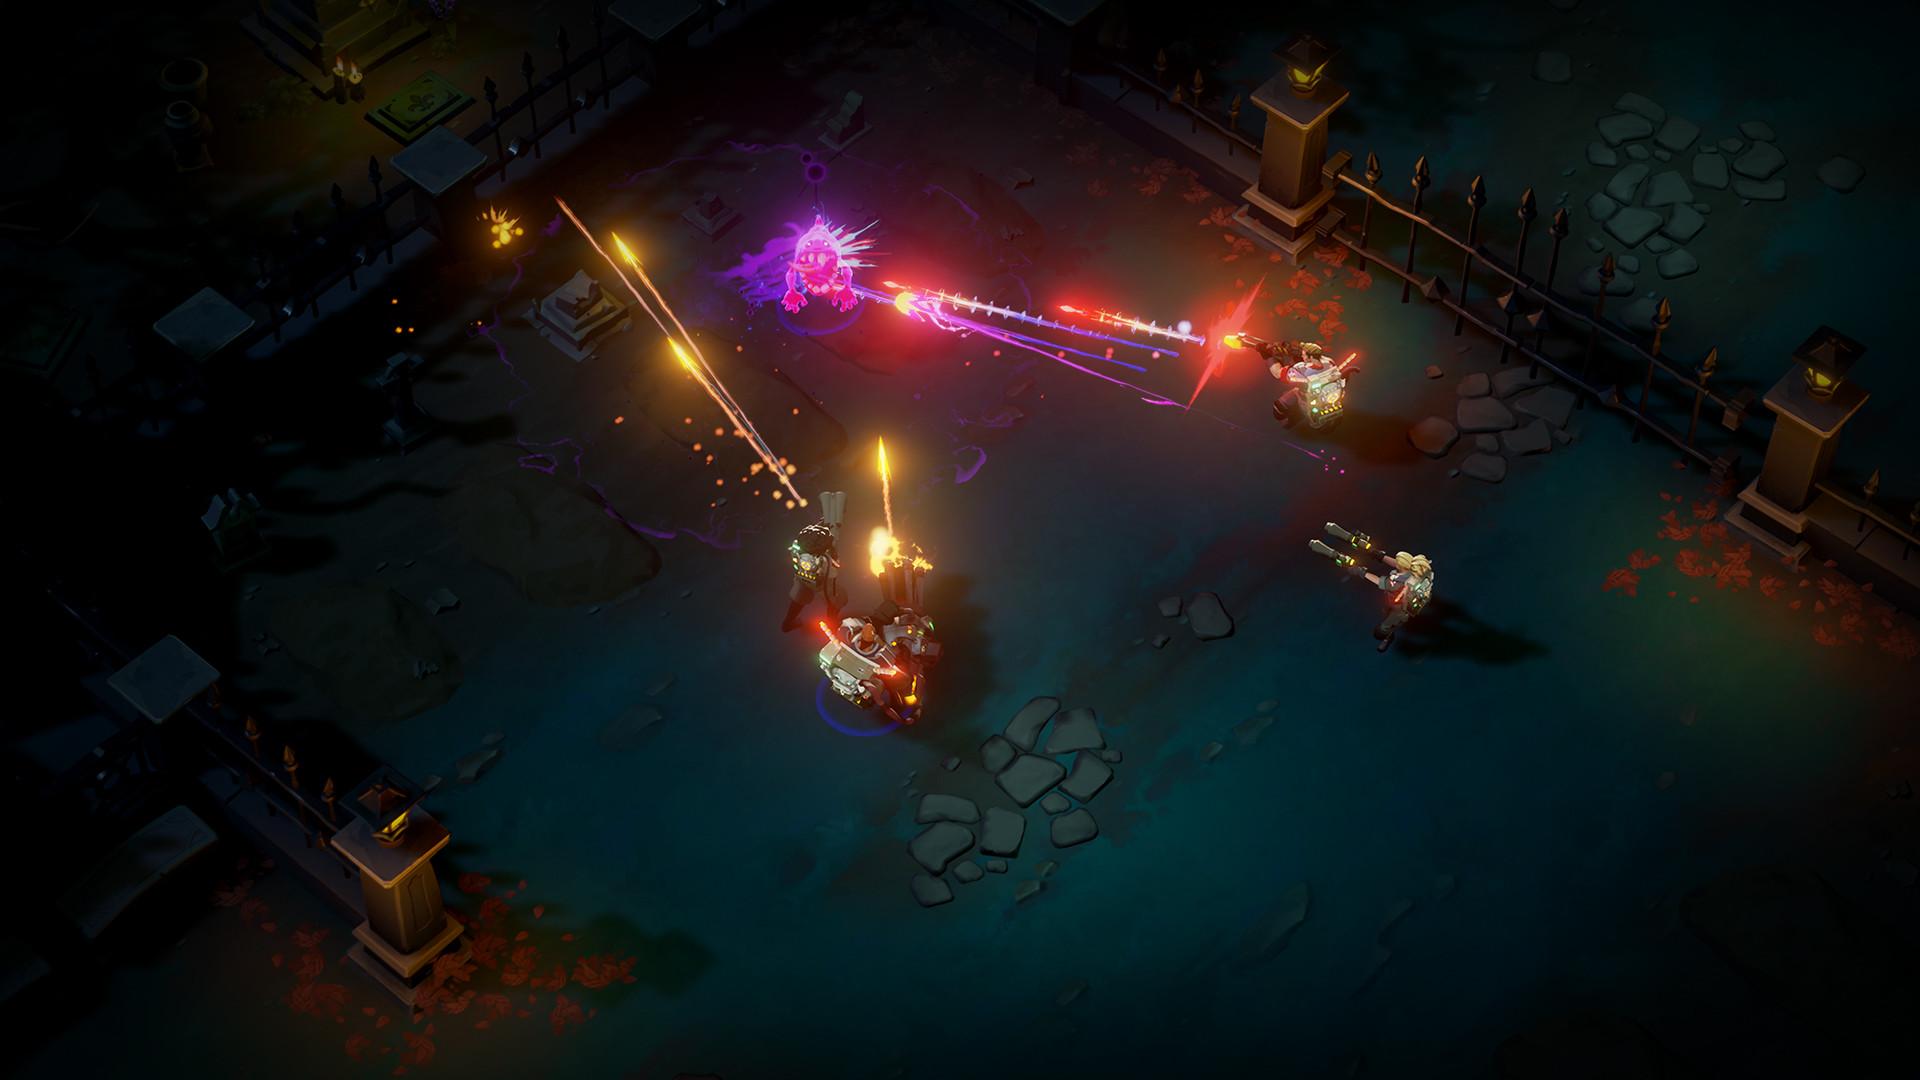 Ghostbusters Screenshot 2